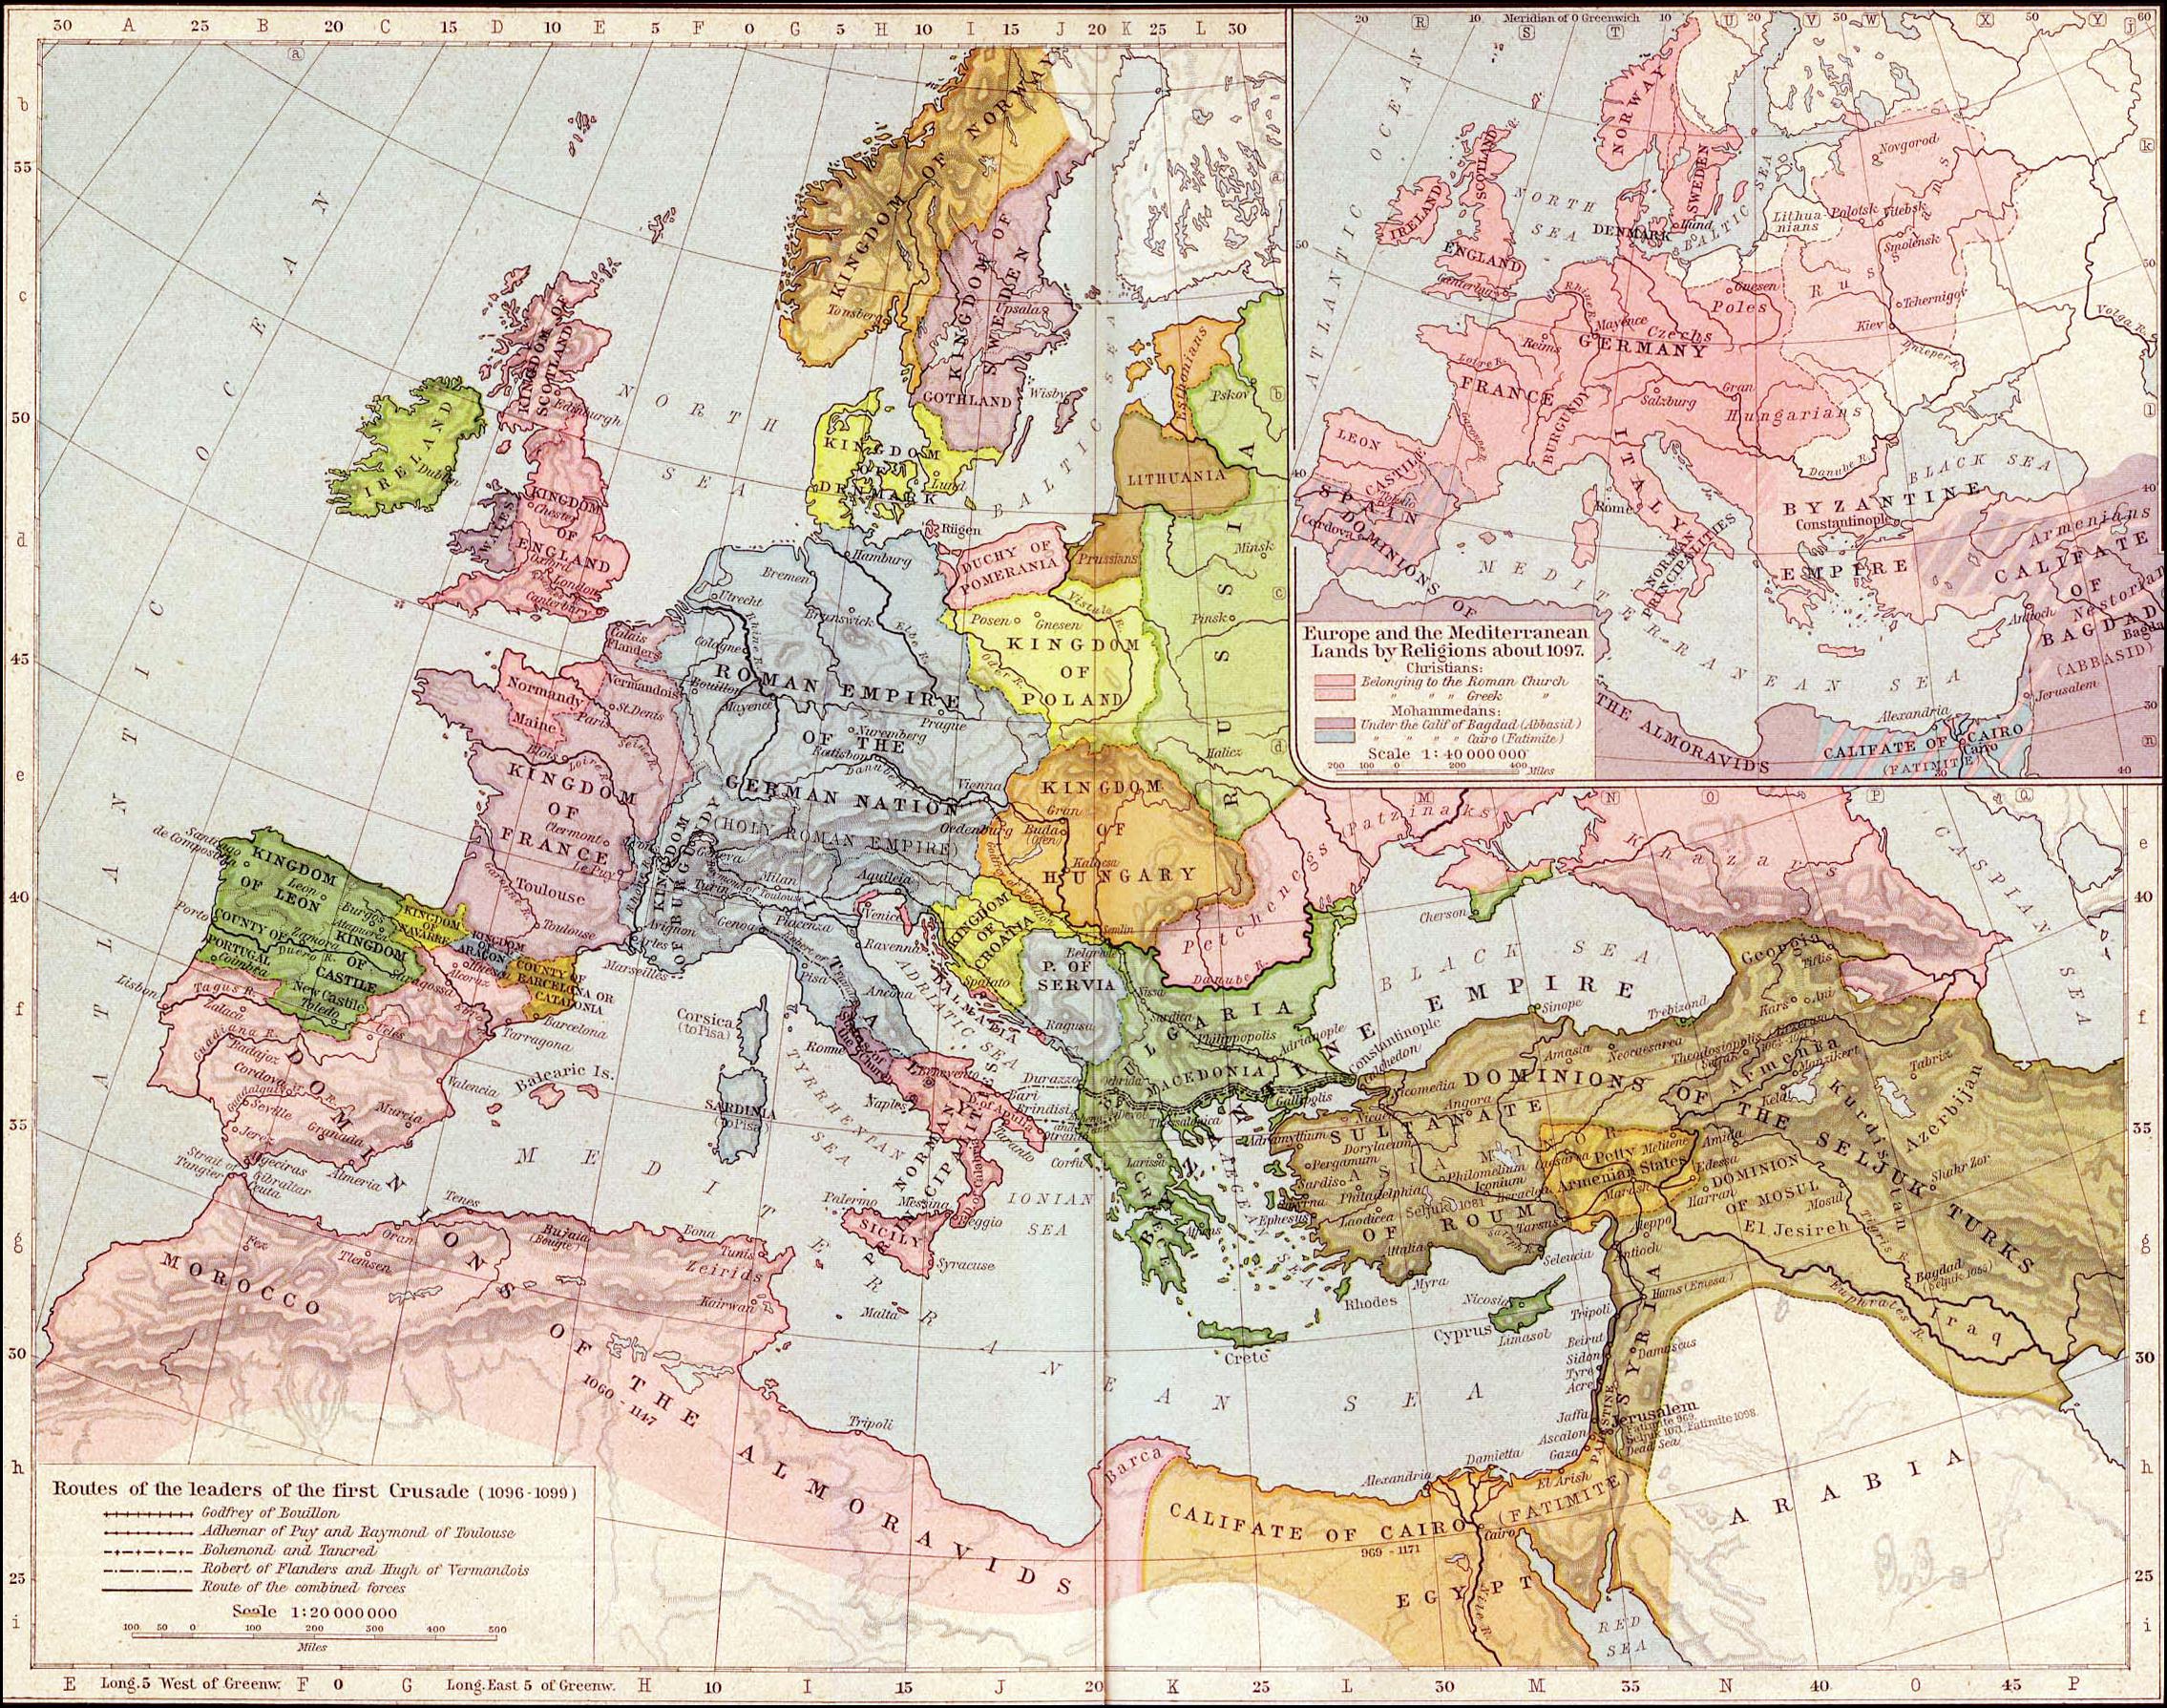 Europe & MENA in 1097